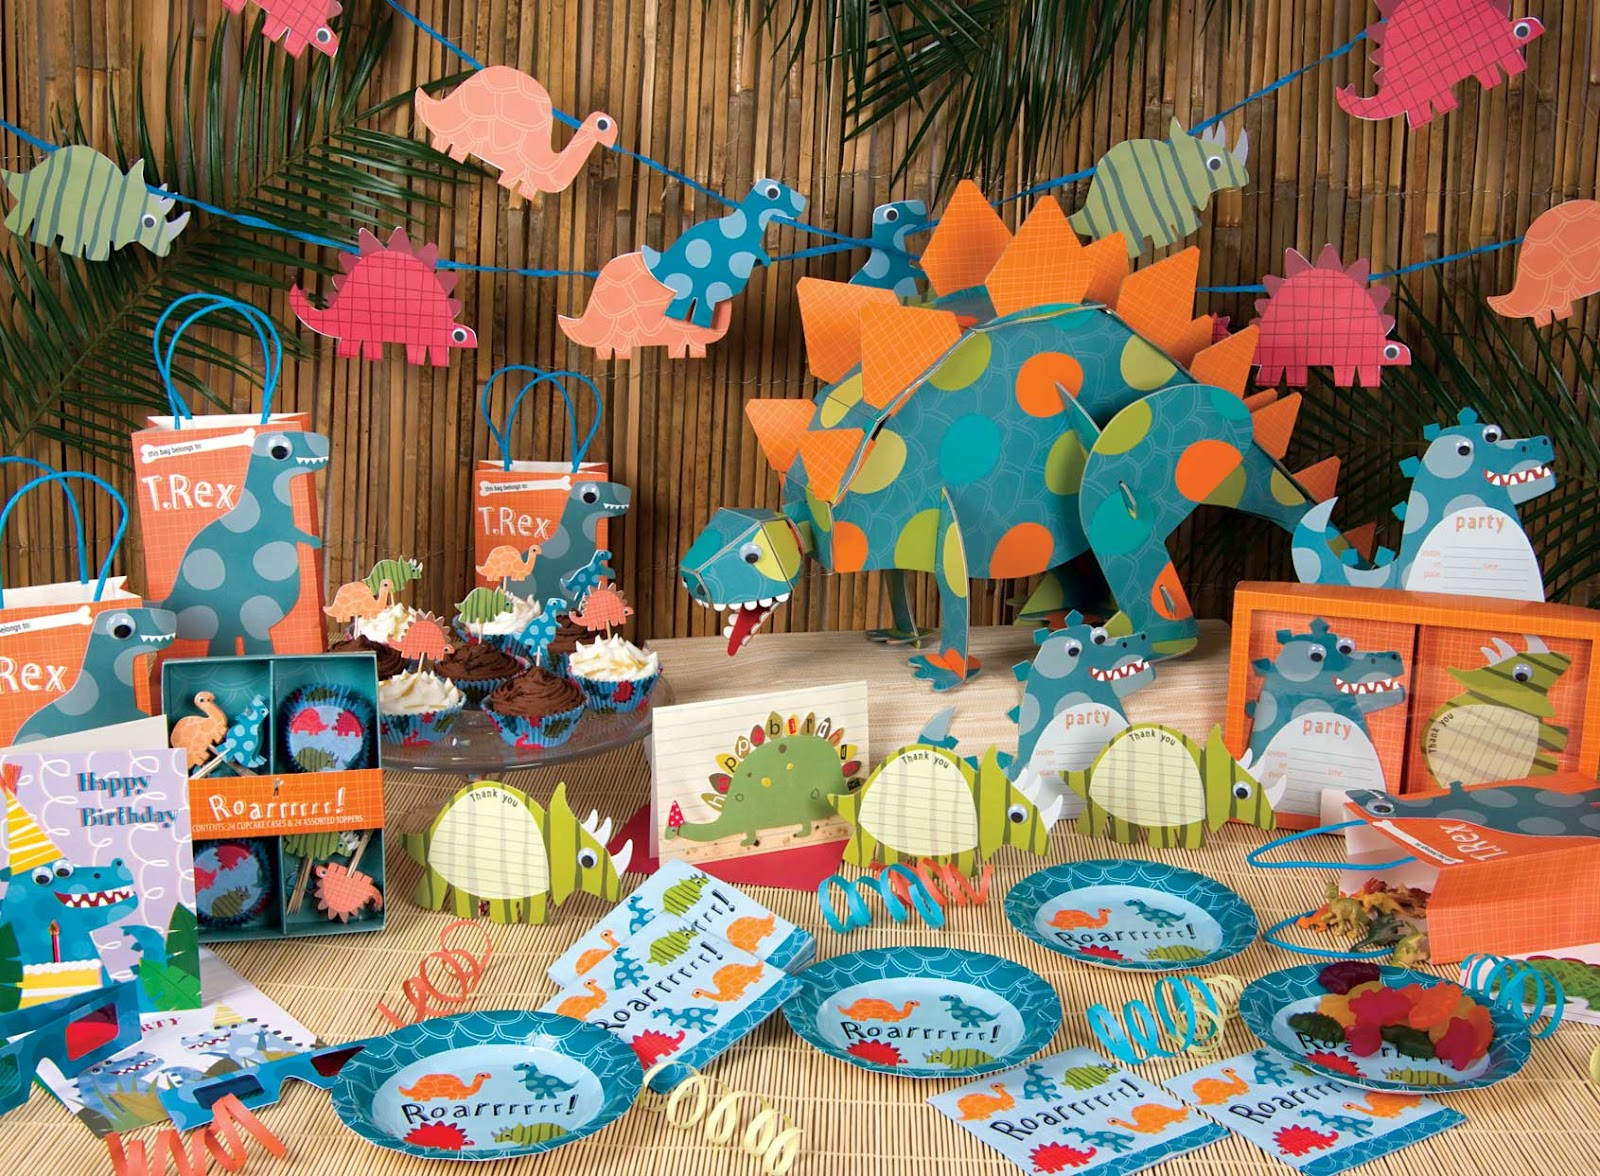 Kalliopelp decoraci n de fiestas infantiles de dinosaurios - Decoracion para fiestas de cumpleanos infantiles ...